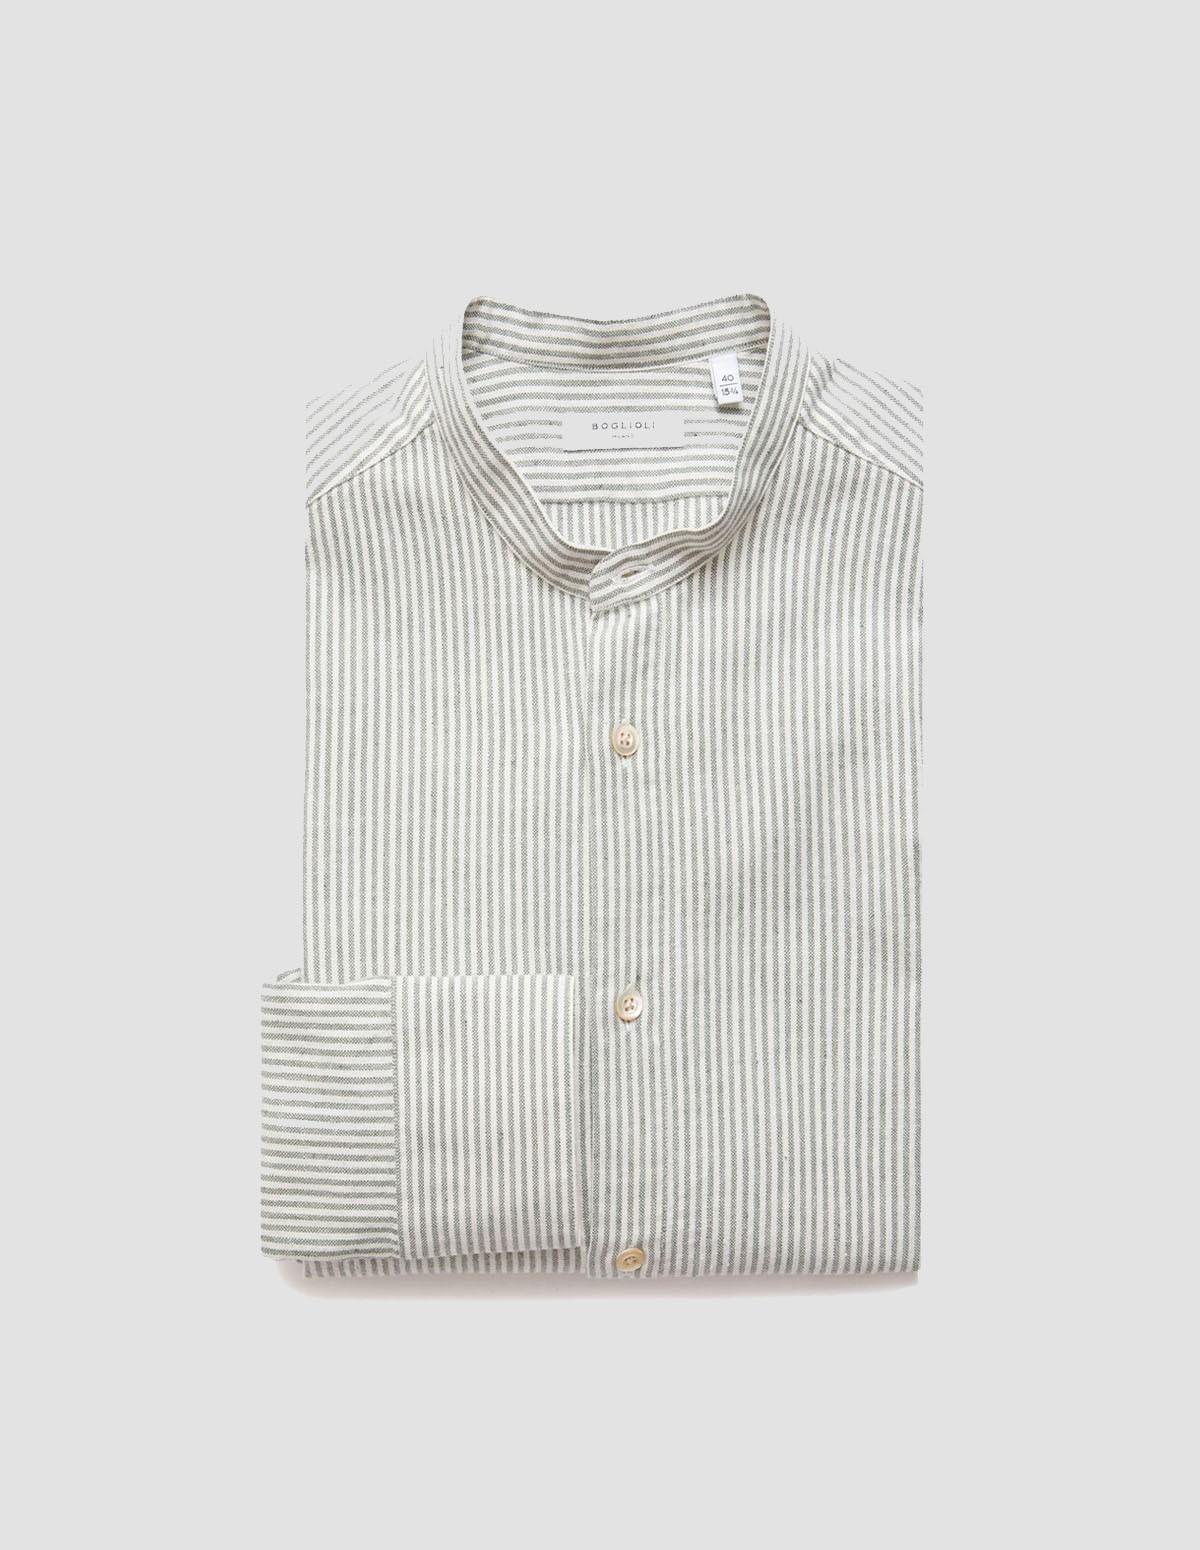 Boglioli Guru Stripe Shirt - 0195